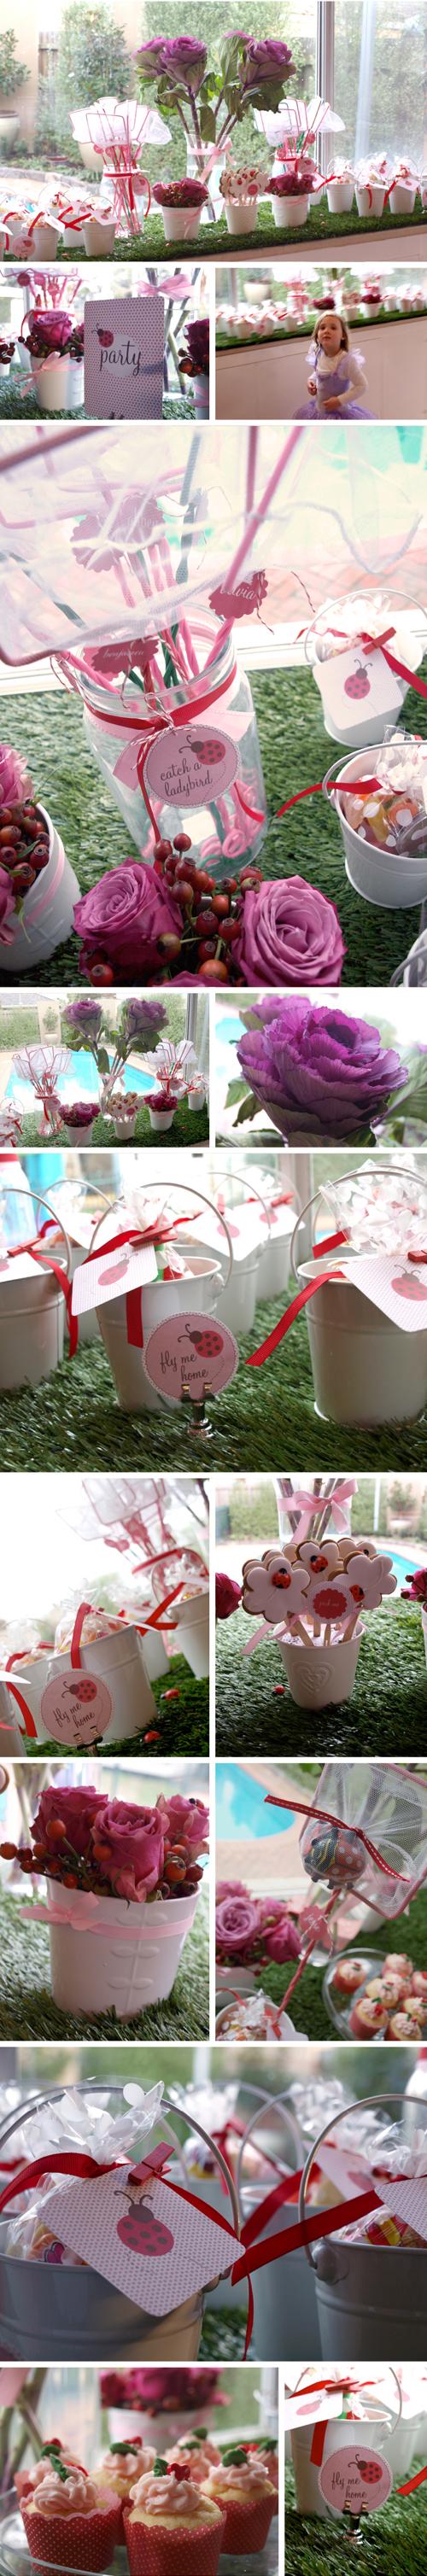 Alannah Rose Party   Ellas Lovely {ladybird} Garden Party (ladybugs)